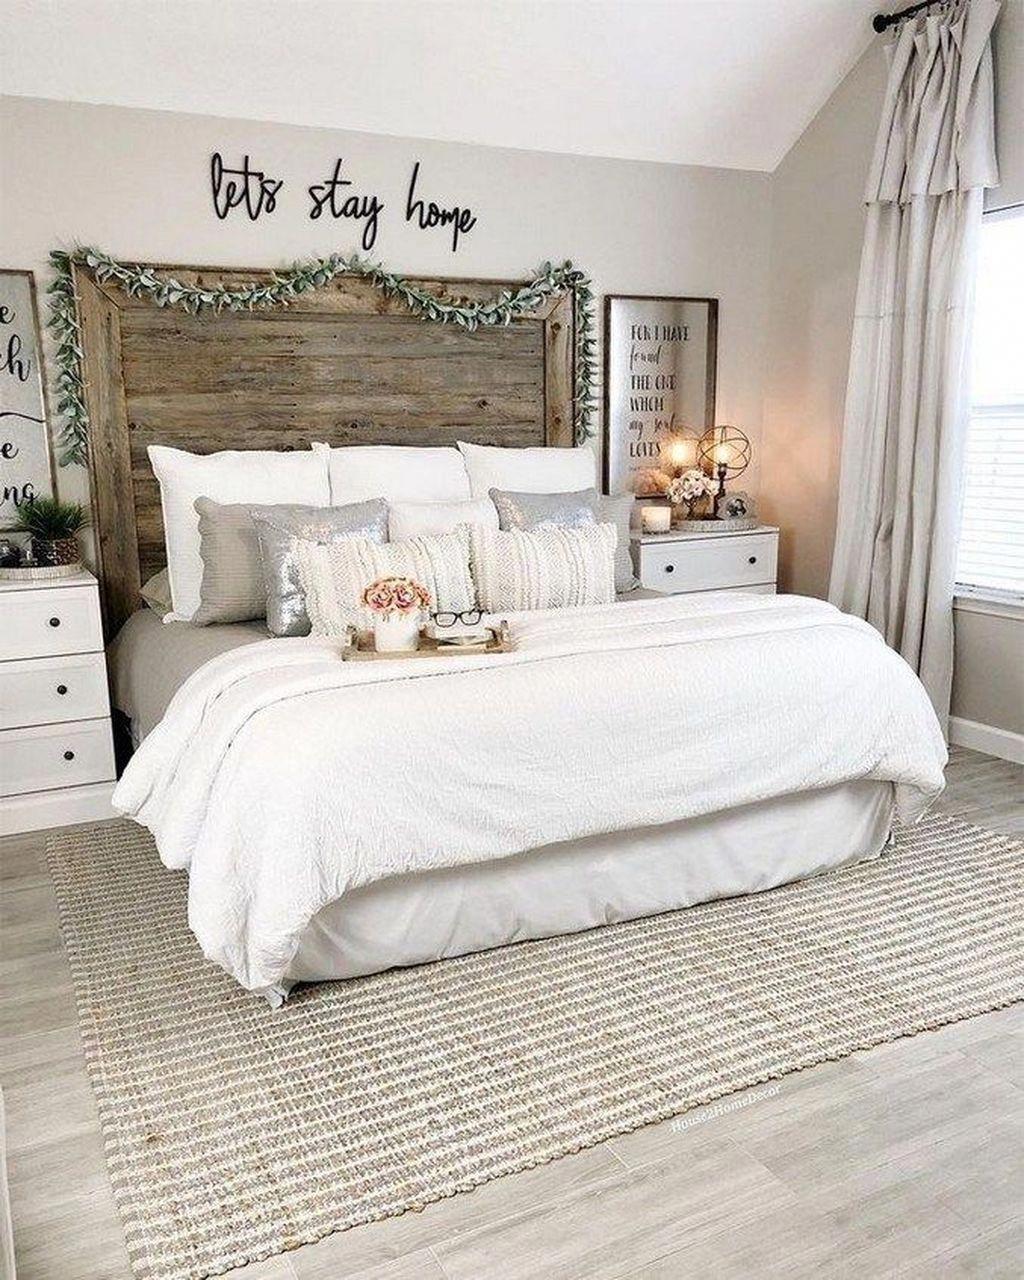 30 Modern Home Decor Ideas: Stylish 30+ Gorgeous Farmhouse Bedroom Remodel Ideas On A